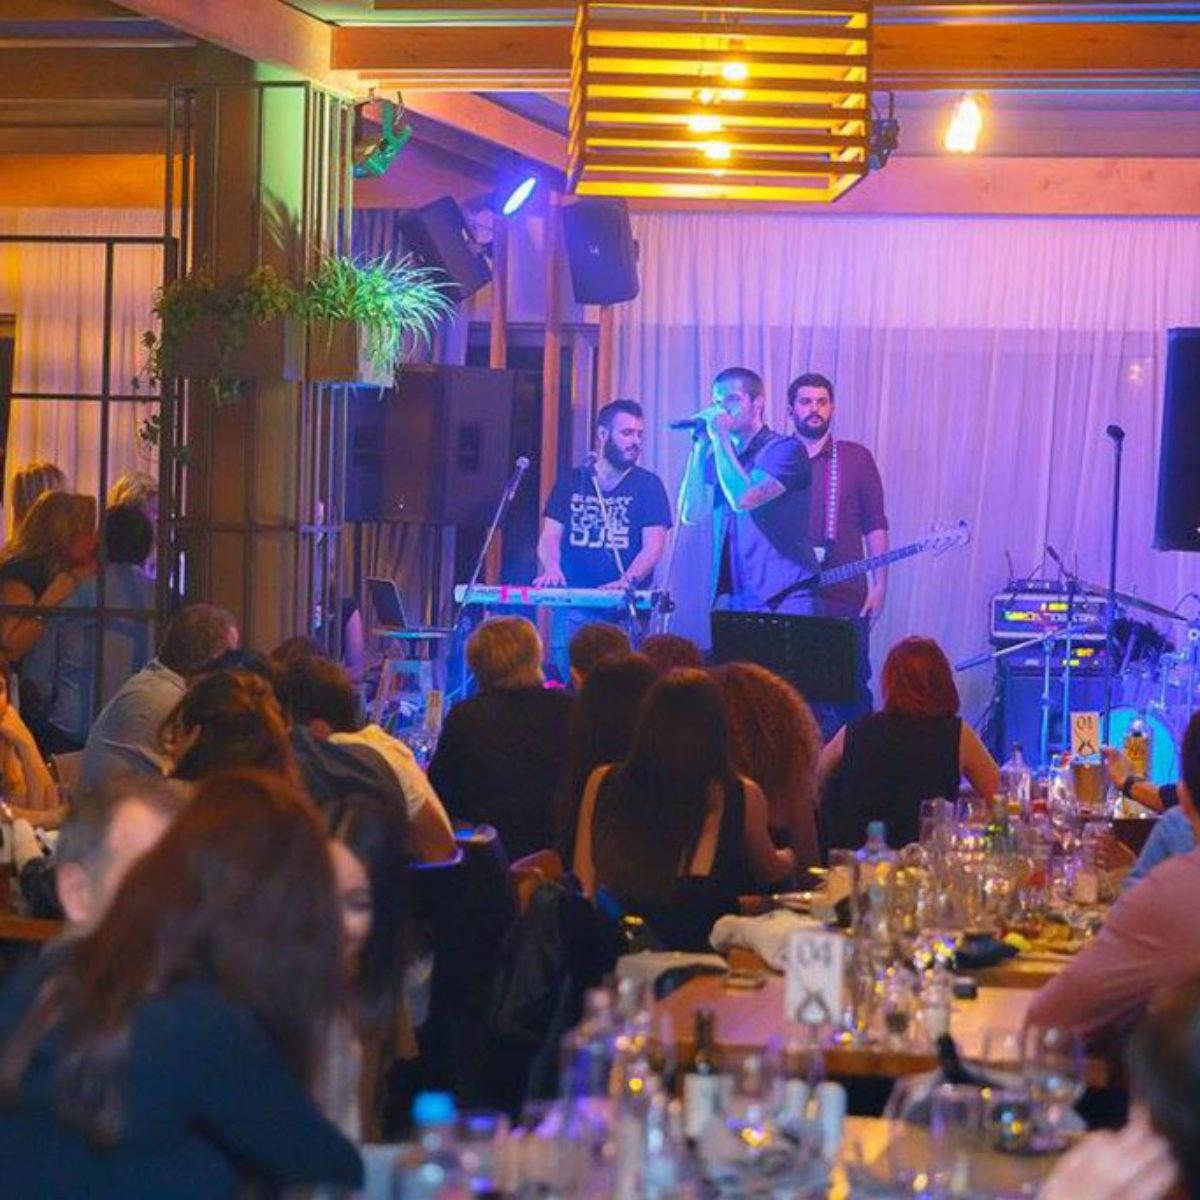 Yiamas Gastro Bar - Καλαμάτα - Μοντέρνα Ευρωπαϊκή Κουζίνα - Live events 8